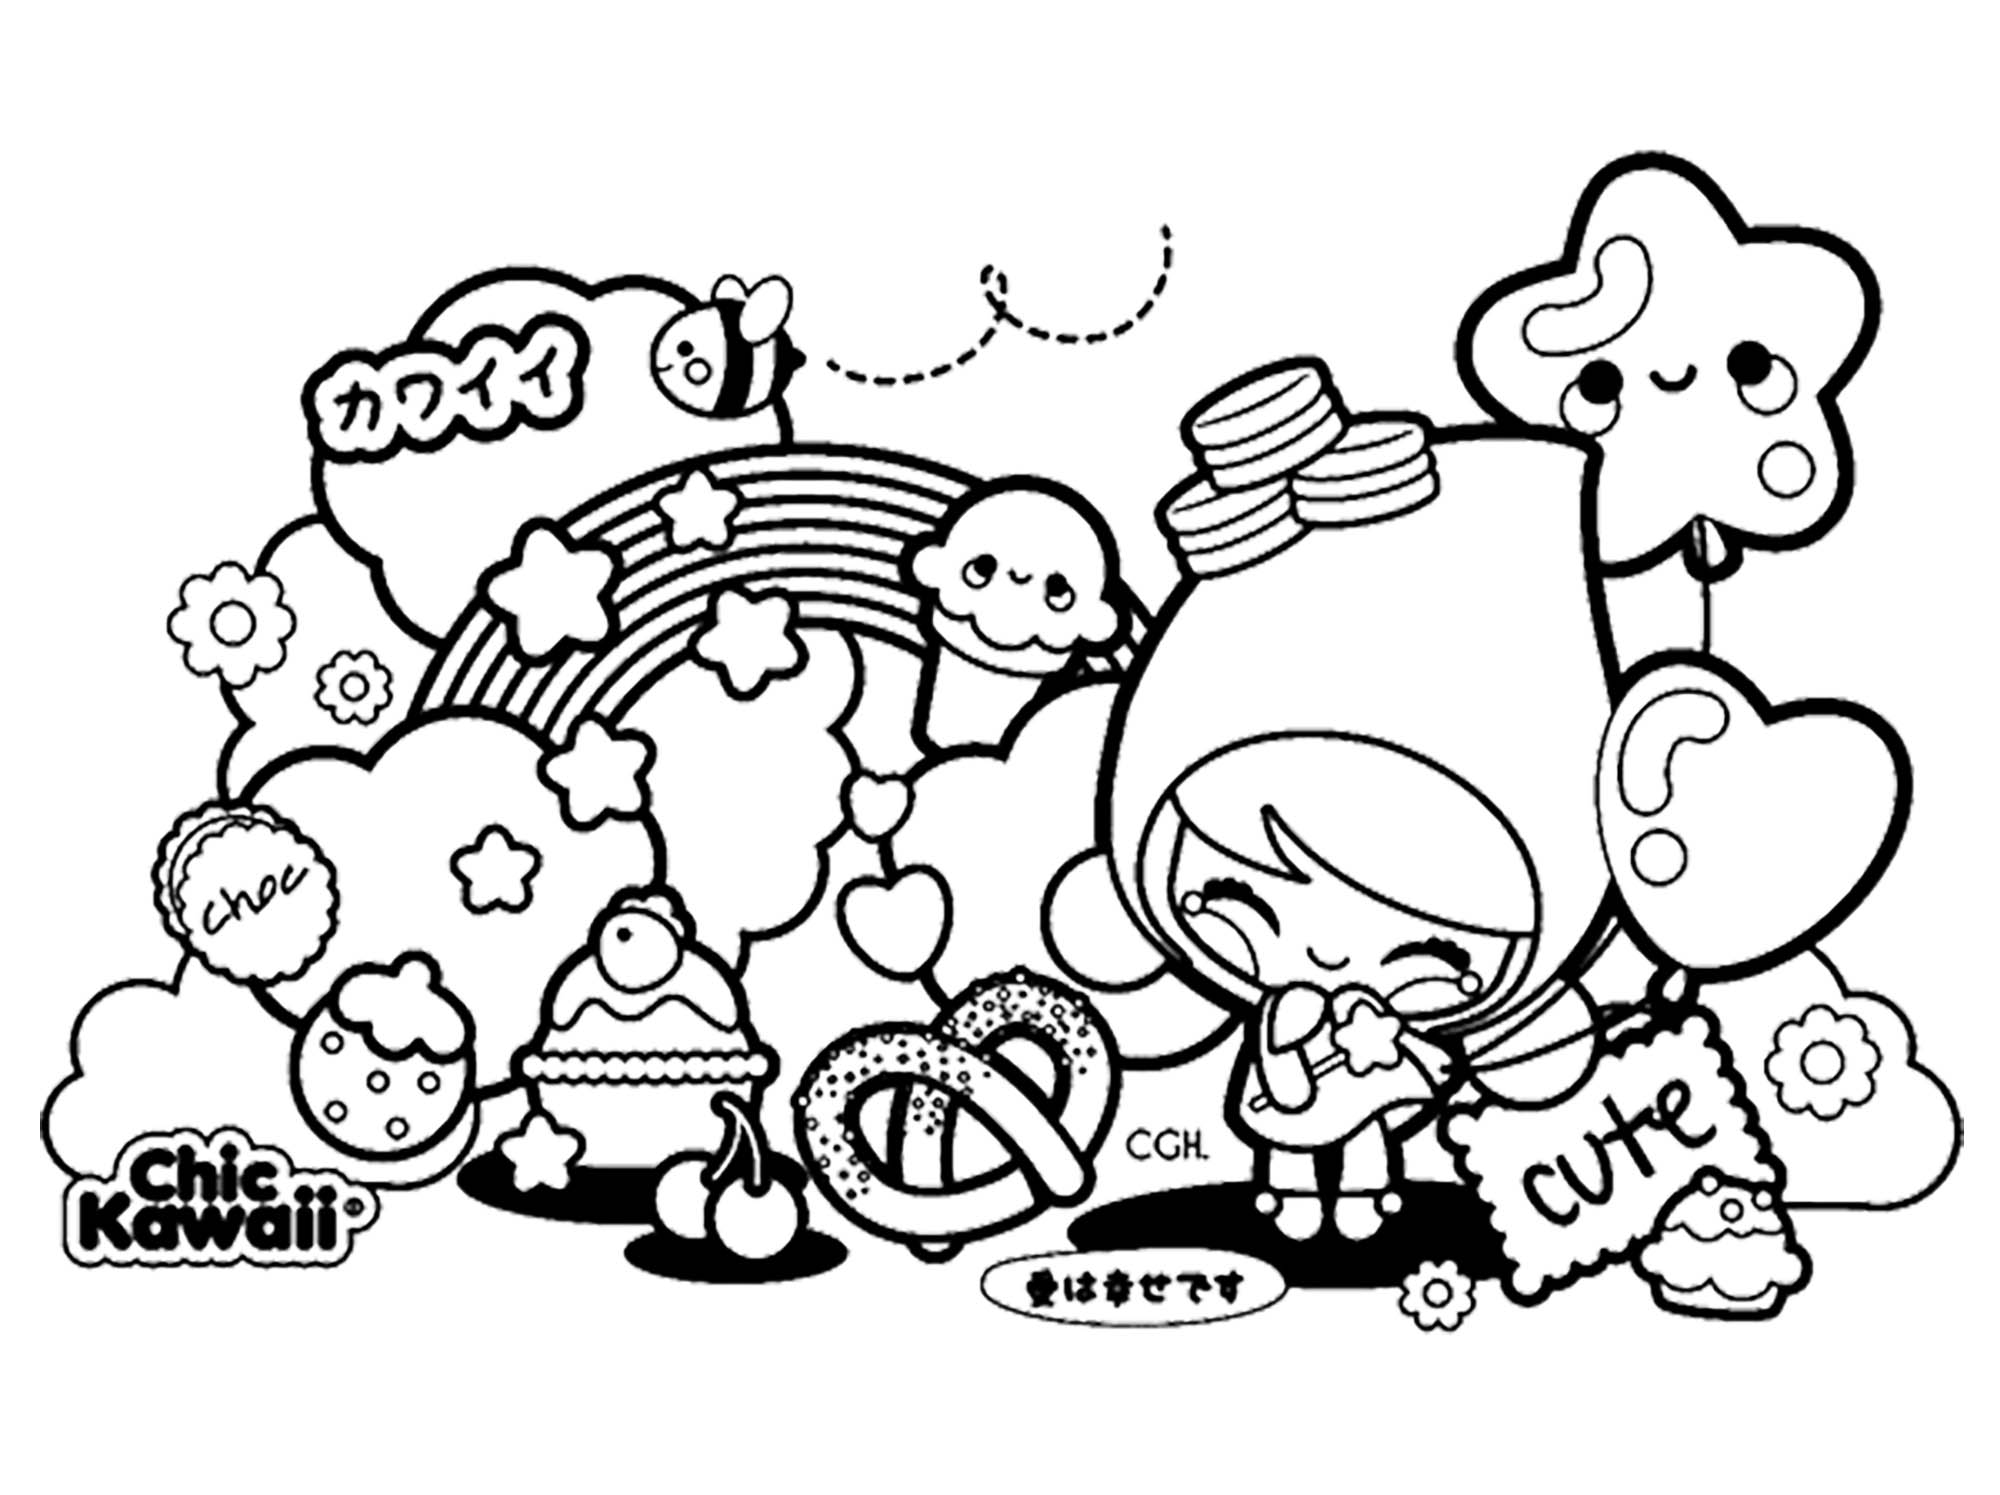 Colorear para adultos  : Mangas - 1